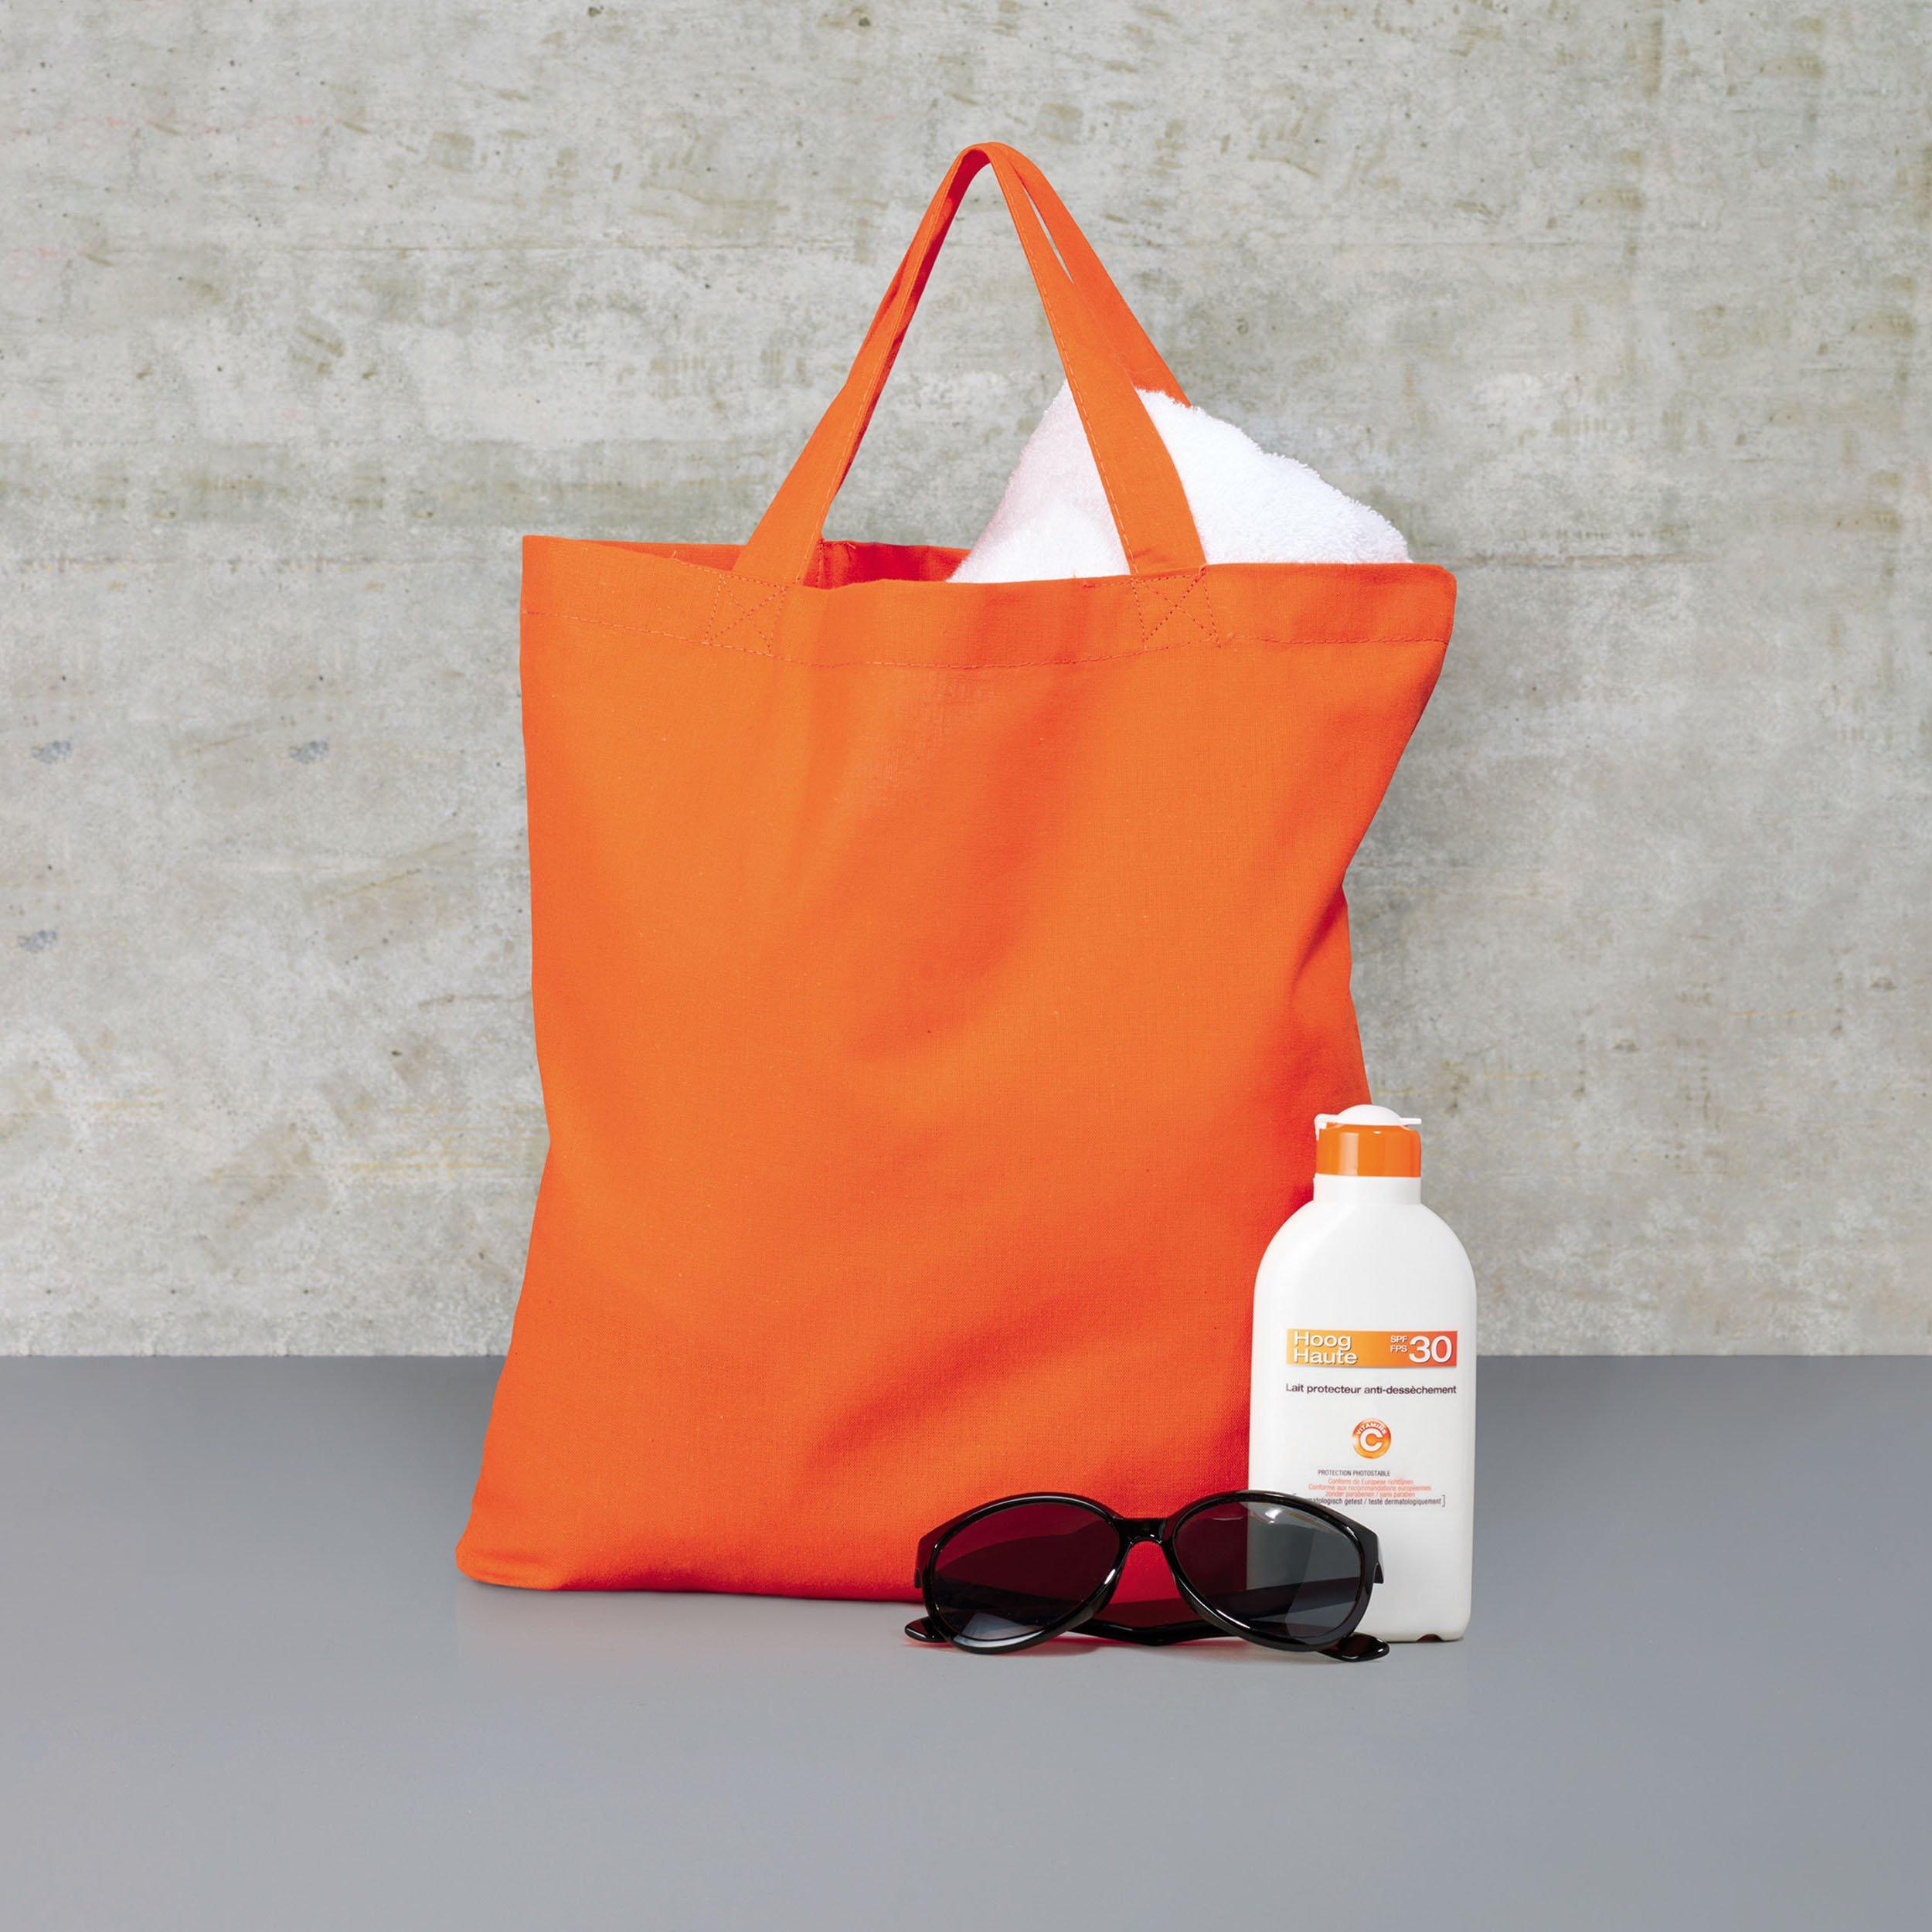 Bags by Jassz Cedar tote bag